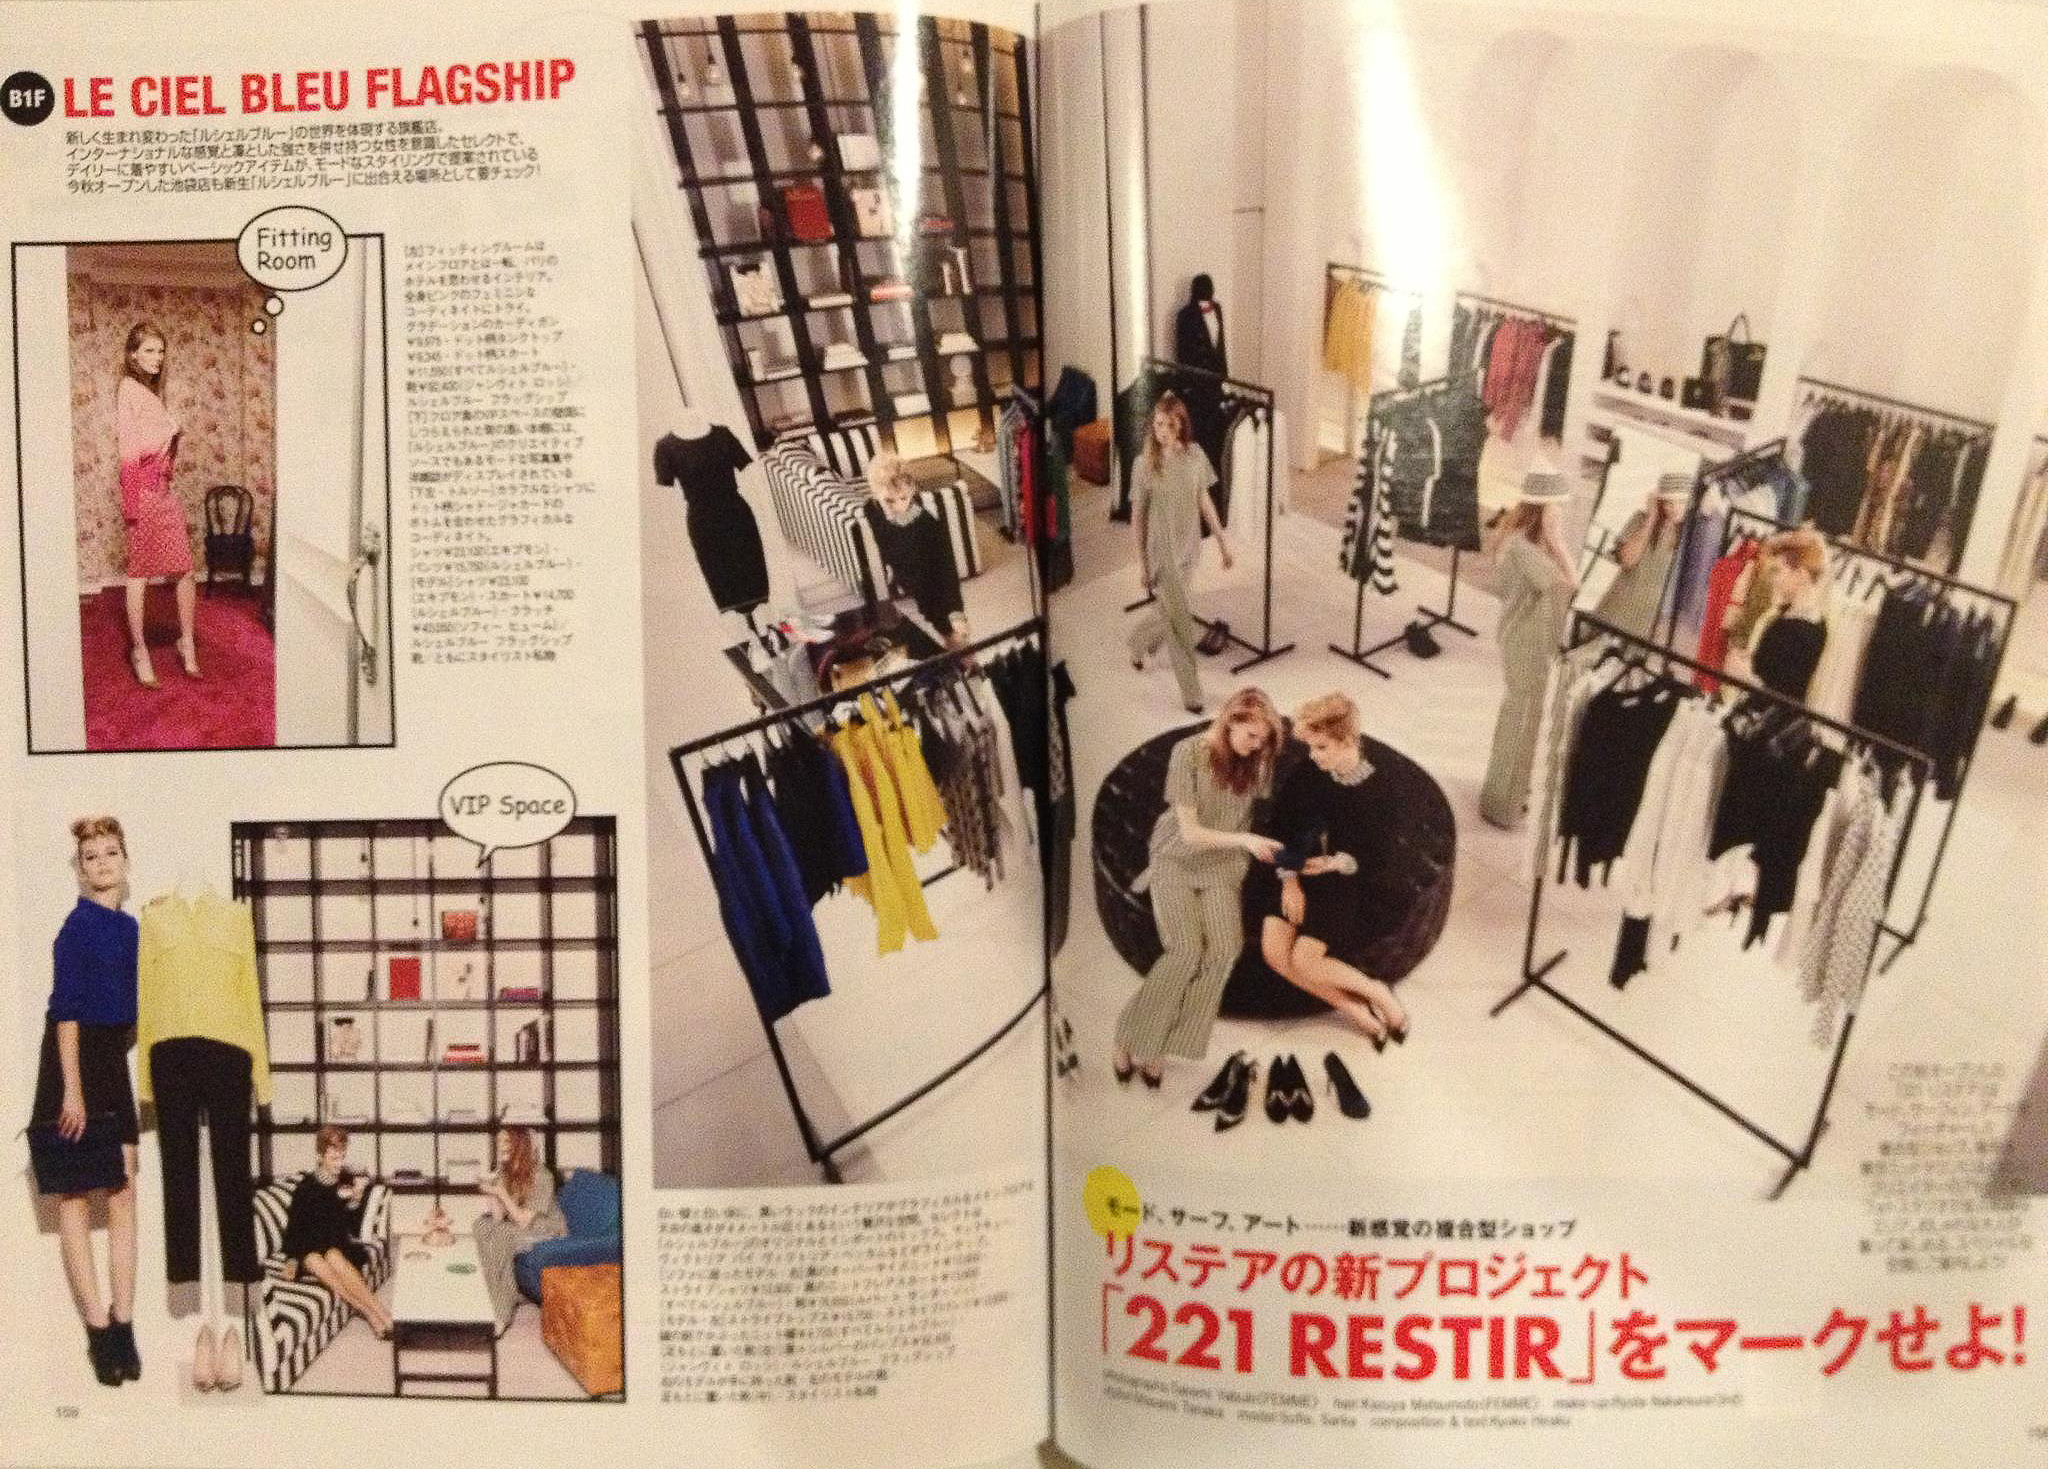 2013-01-21-spur-magazine-shannon-o-connell-ron-croci-2.jpg